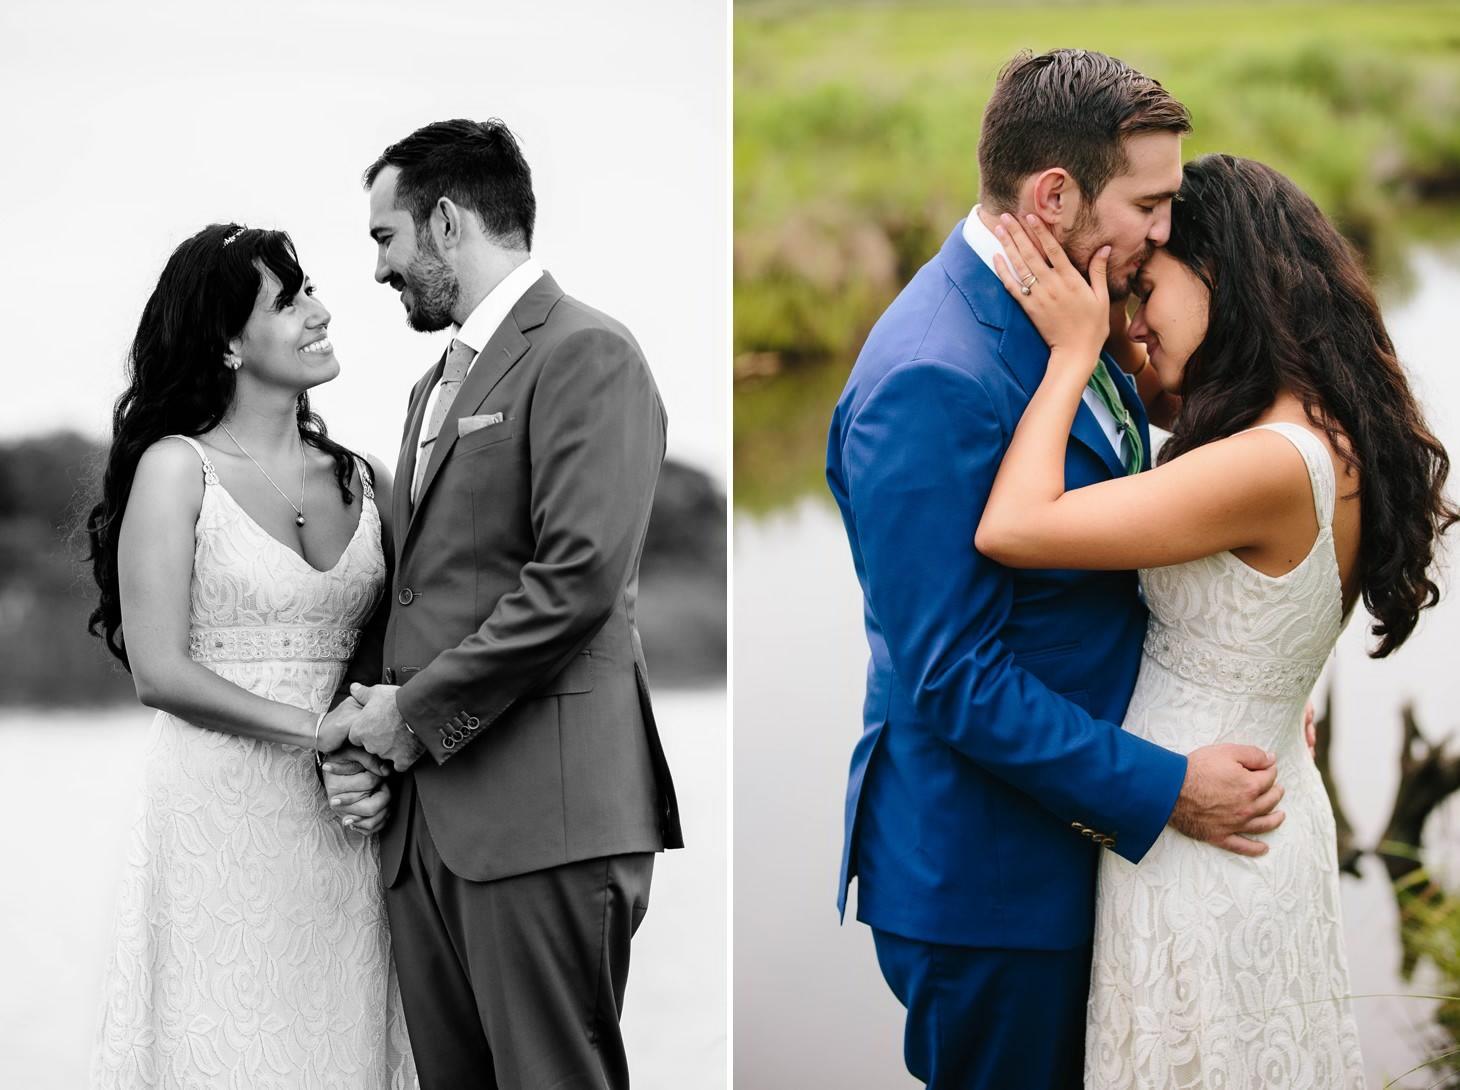 007-nyc-wedding-photographer-smitten-chickens-eco-friendly-outdoor-wedding-.jpg